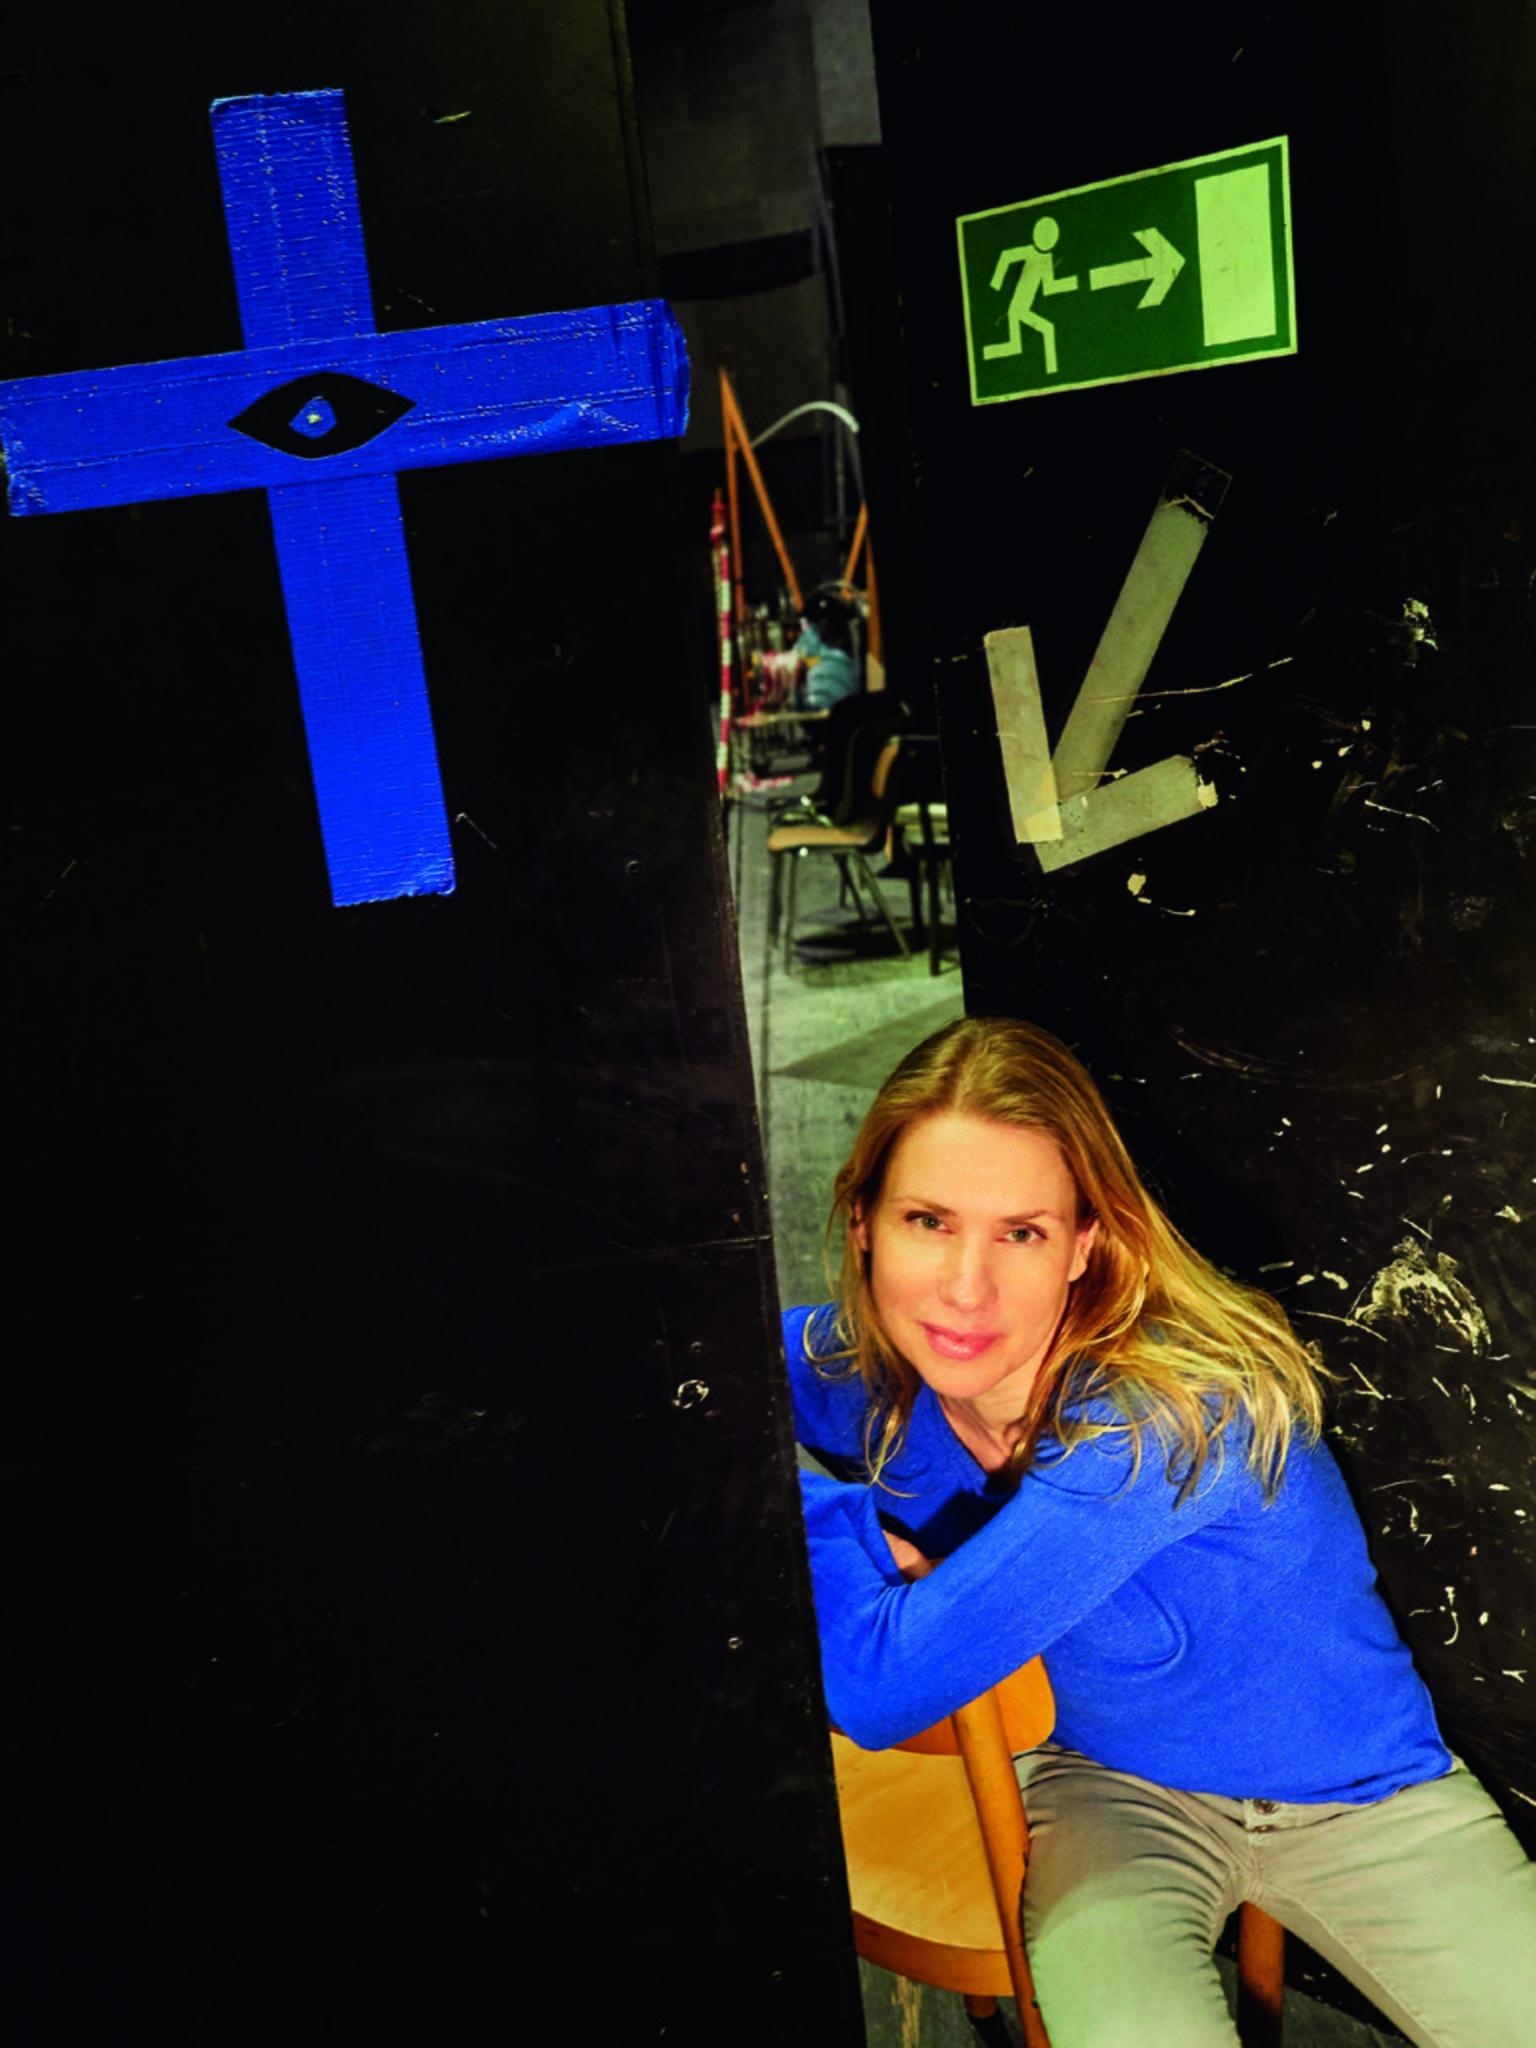 Theatermuseum Düsseldorf Tanja Schleiff Auf Dem Roten Sofa